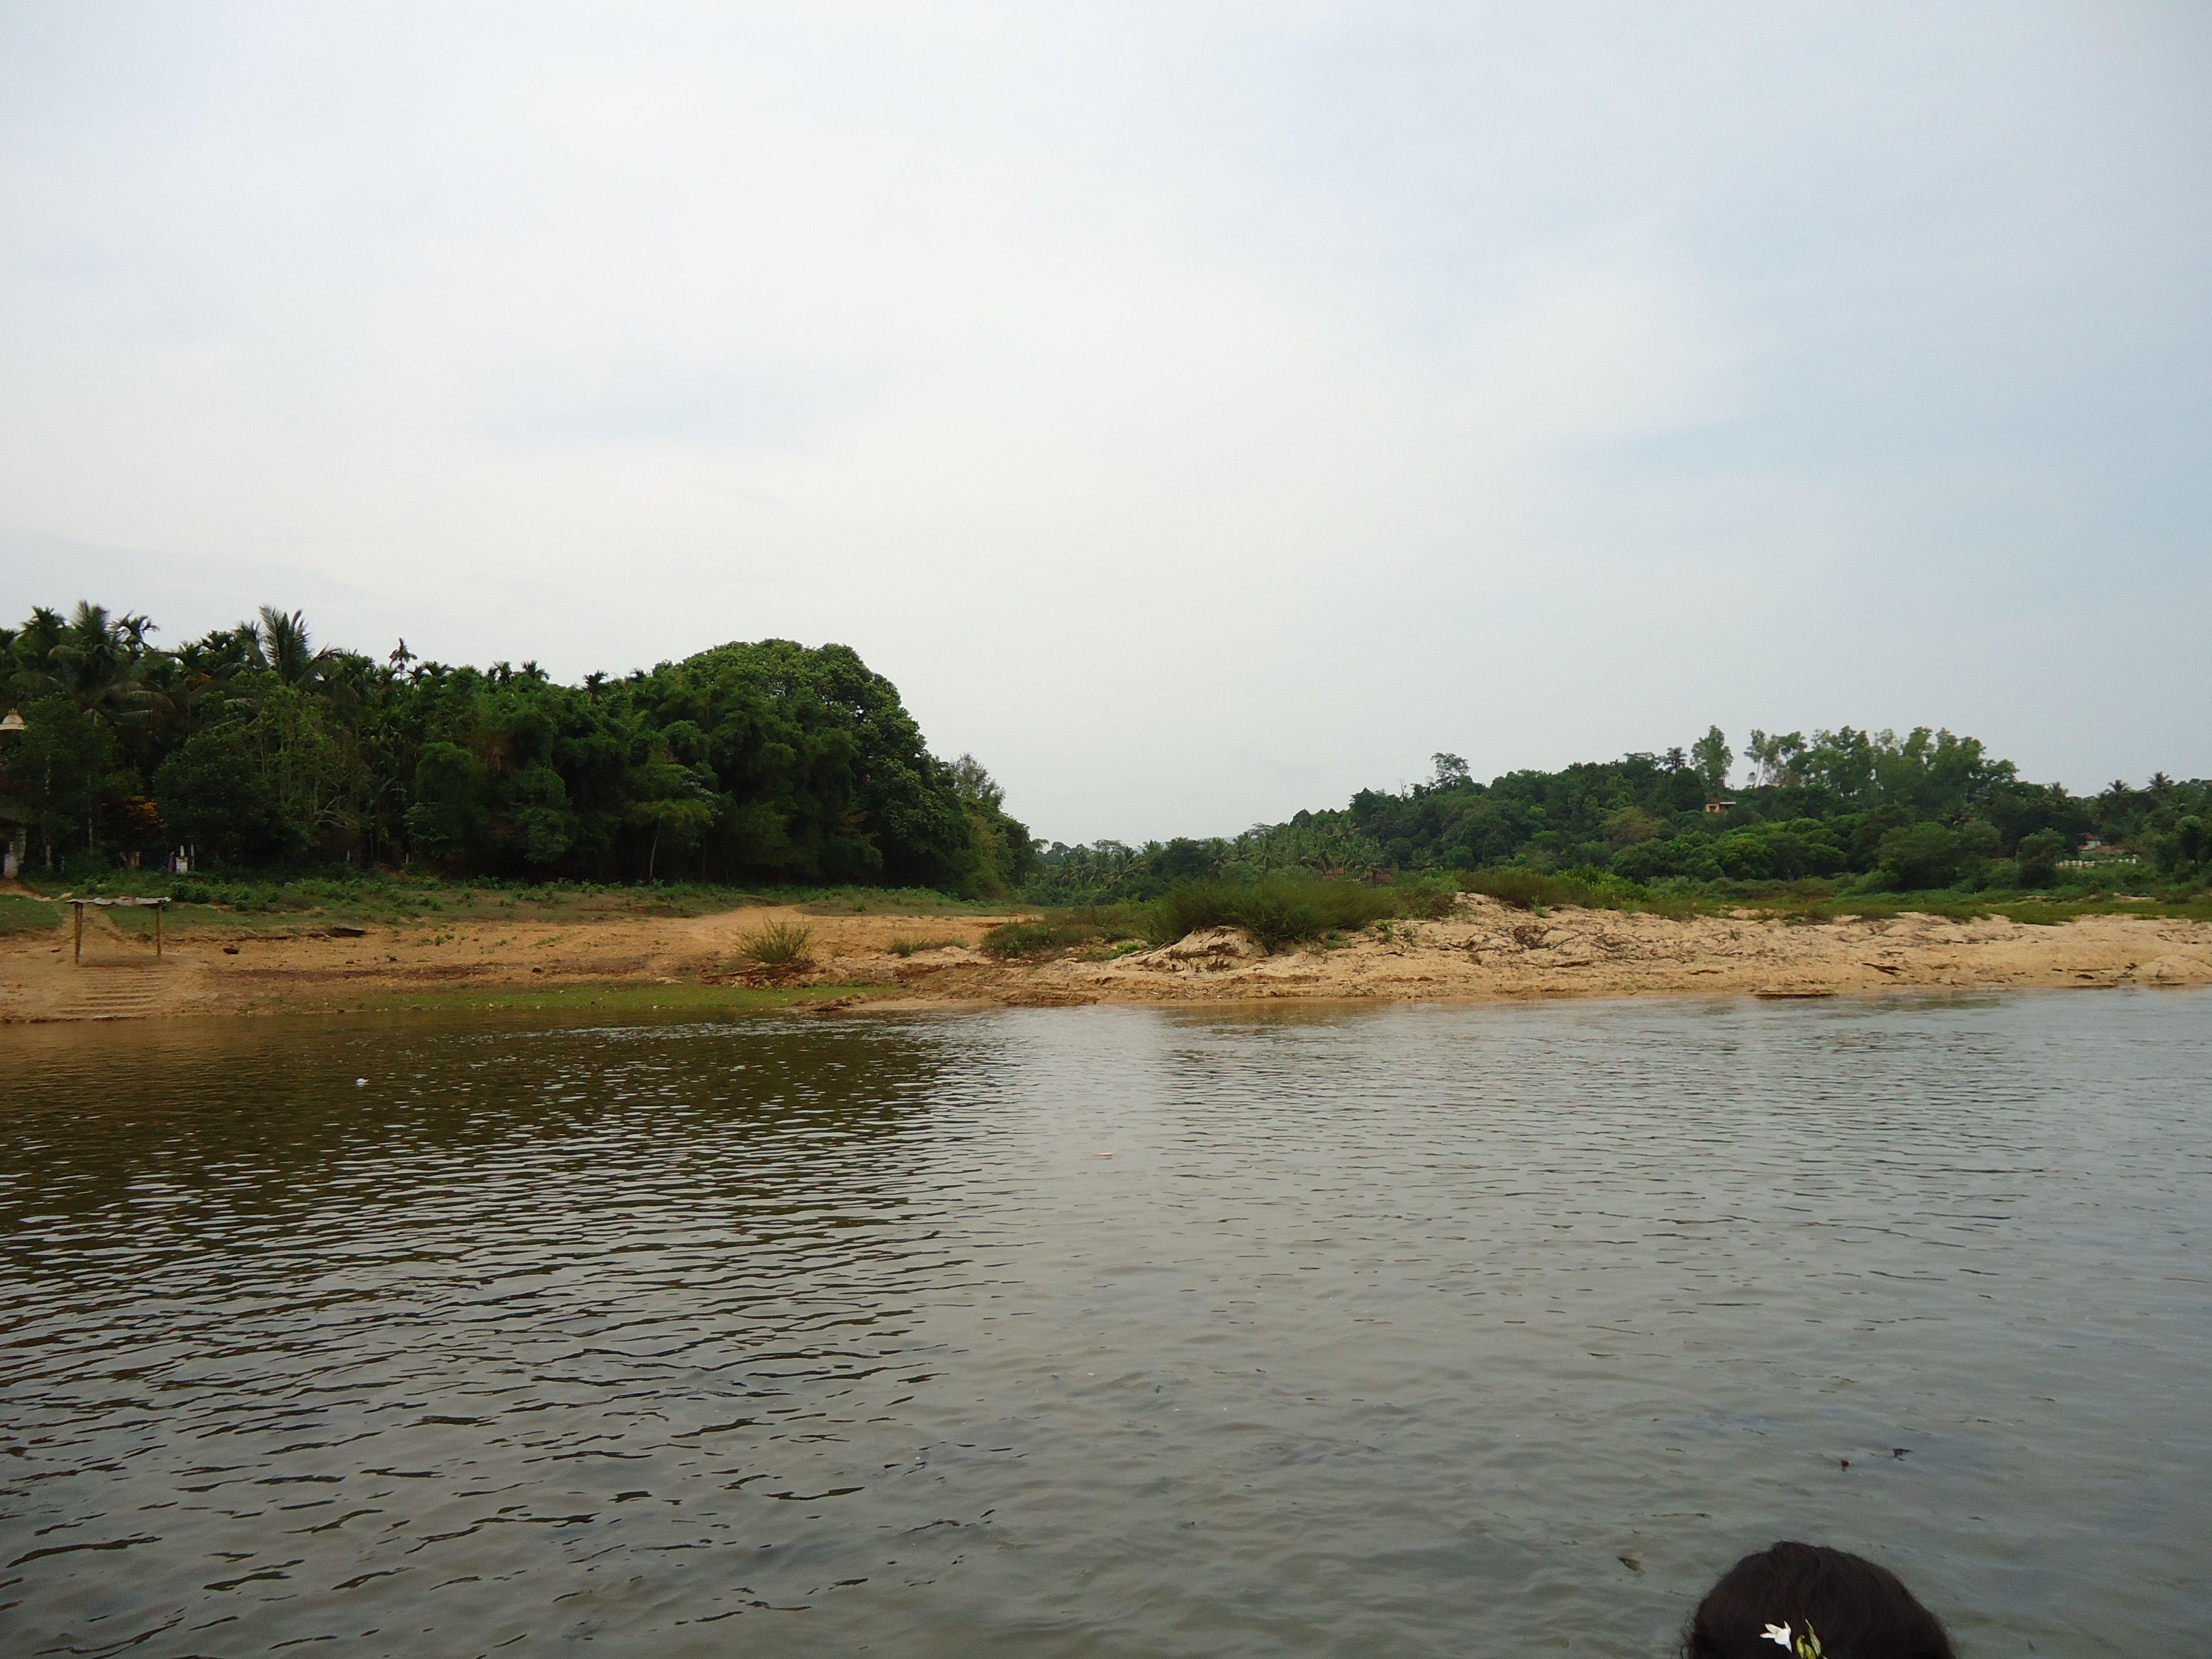 riverside Riverside, Outdoor, River